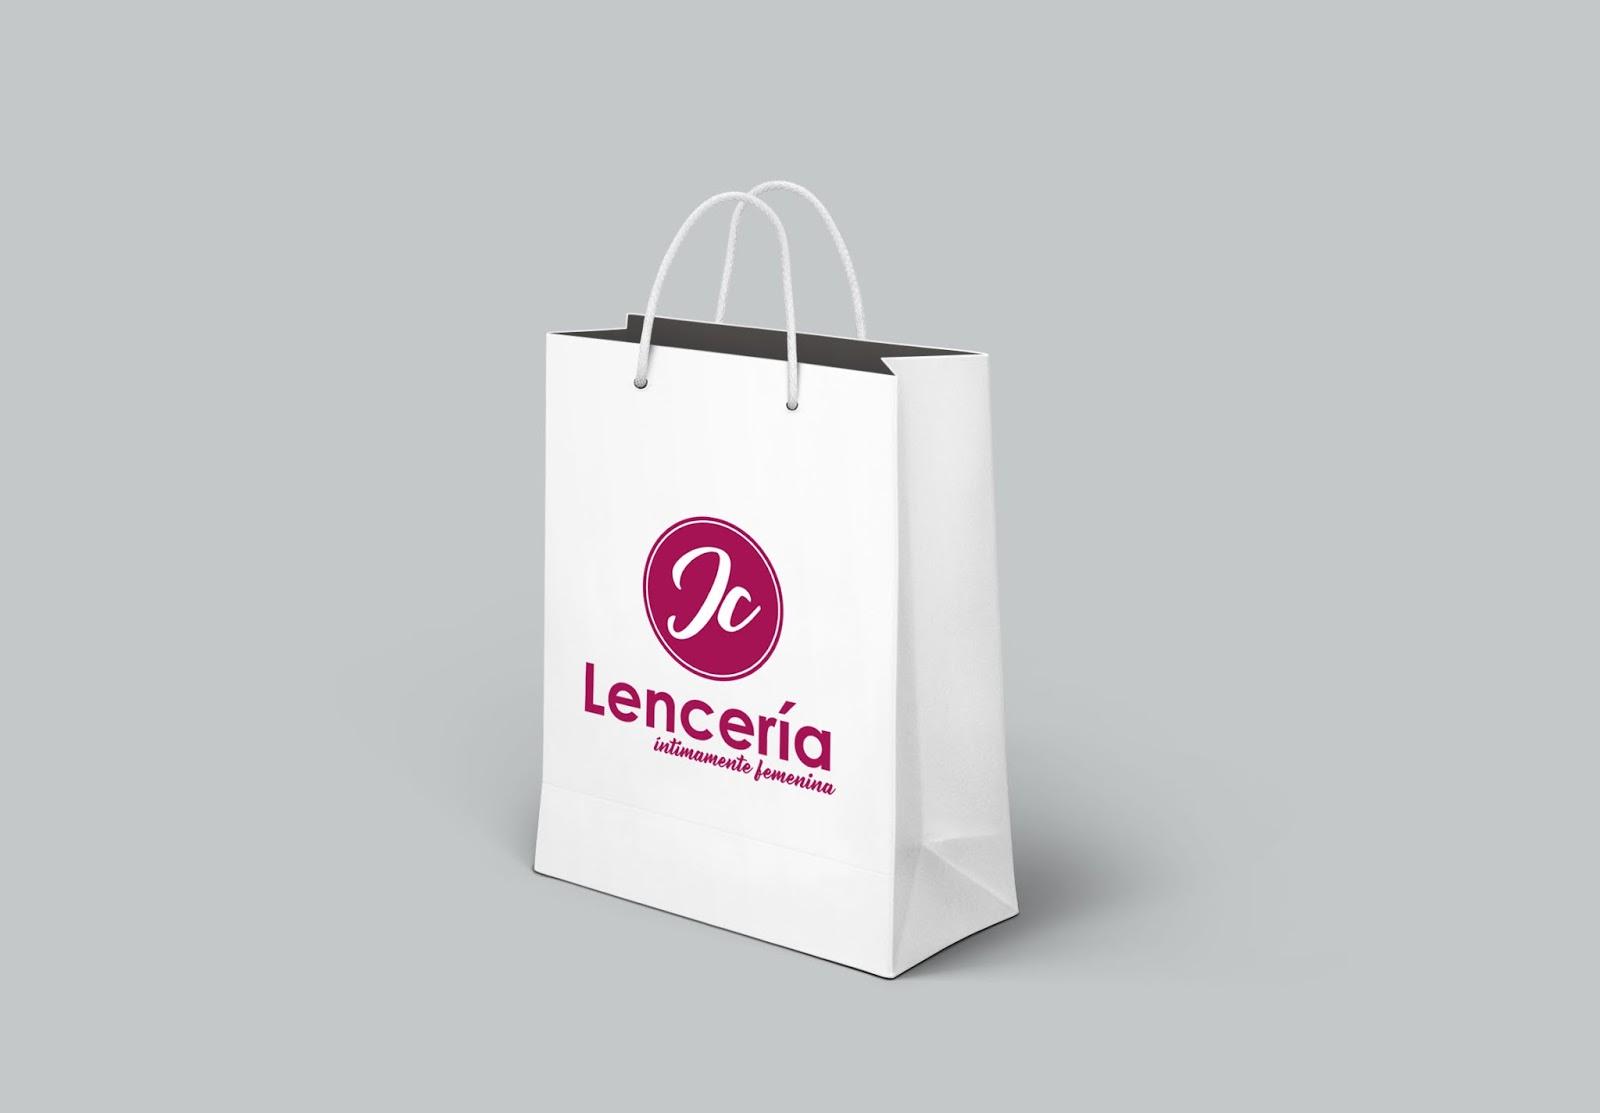 Lenceria Jc